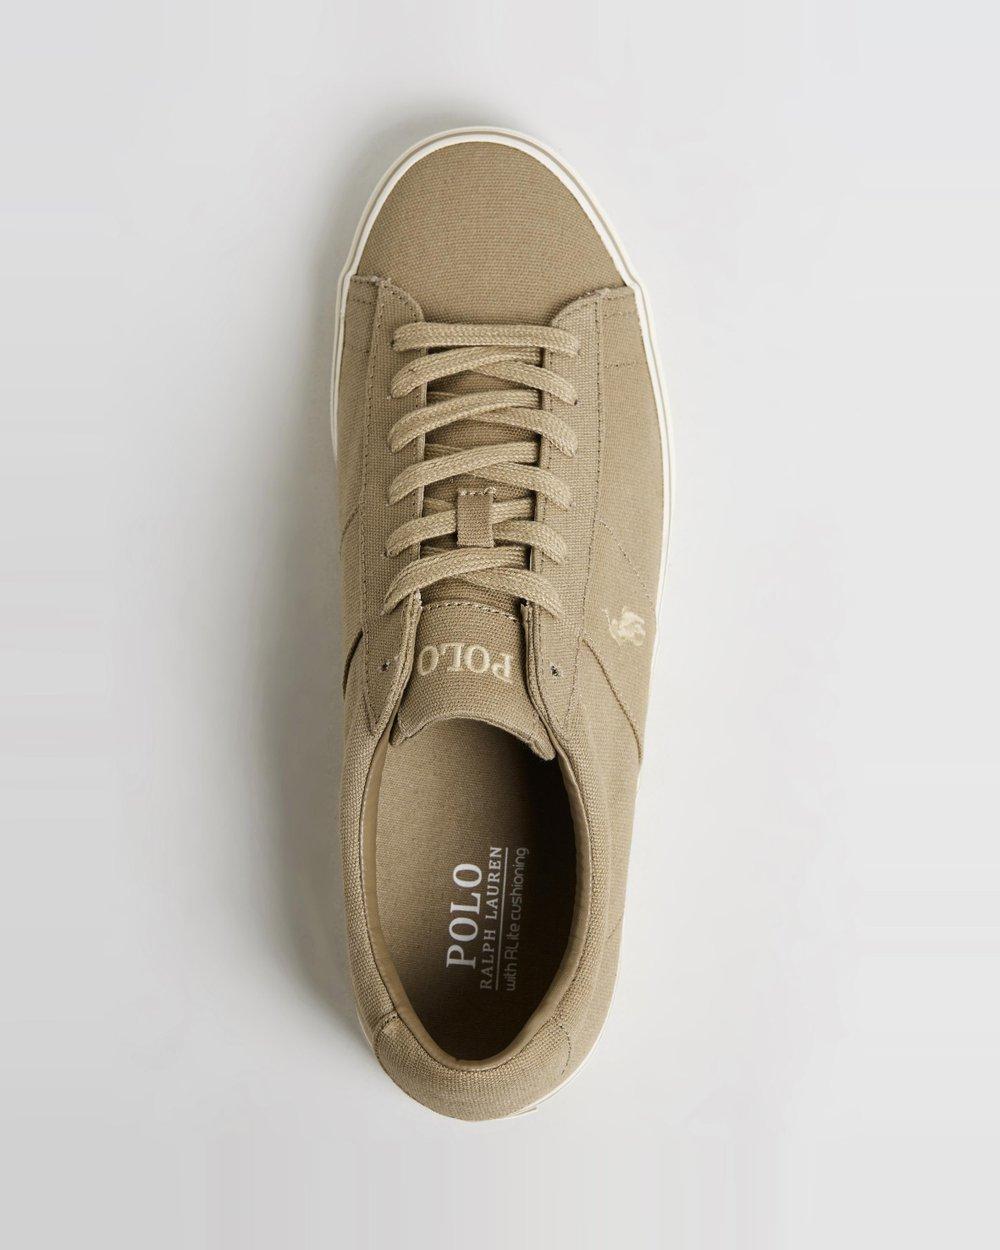 a97495de7fc Sayer Sneakers - Men s by Polo Ralph Lauren Online